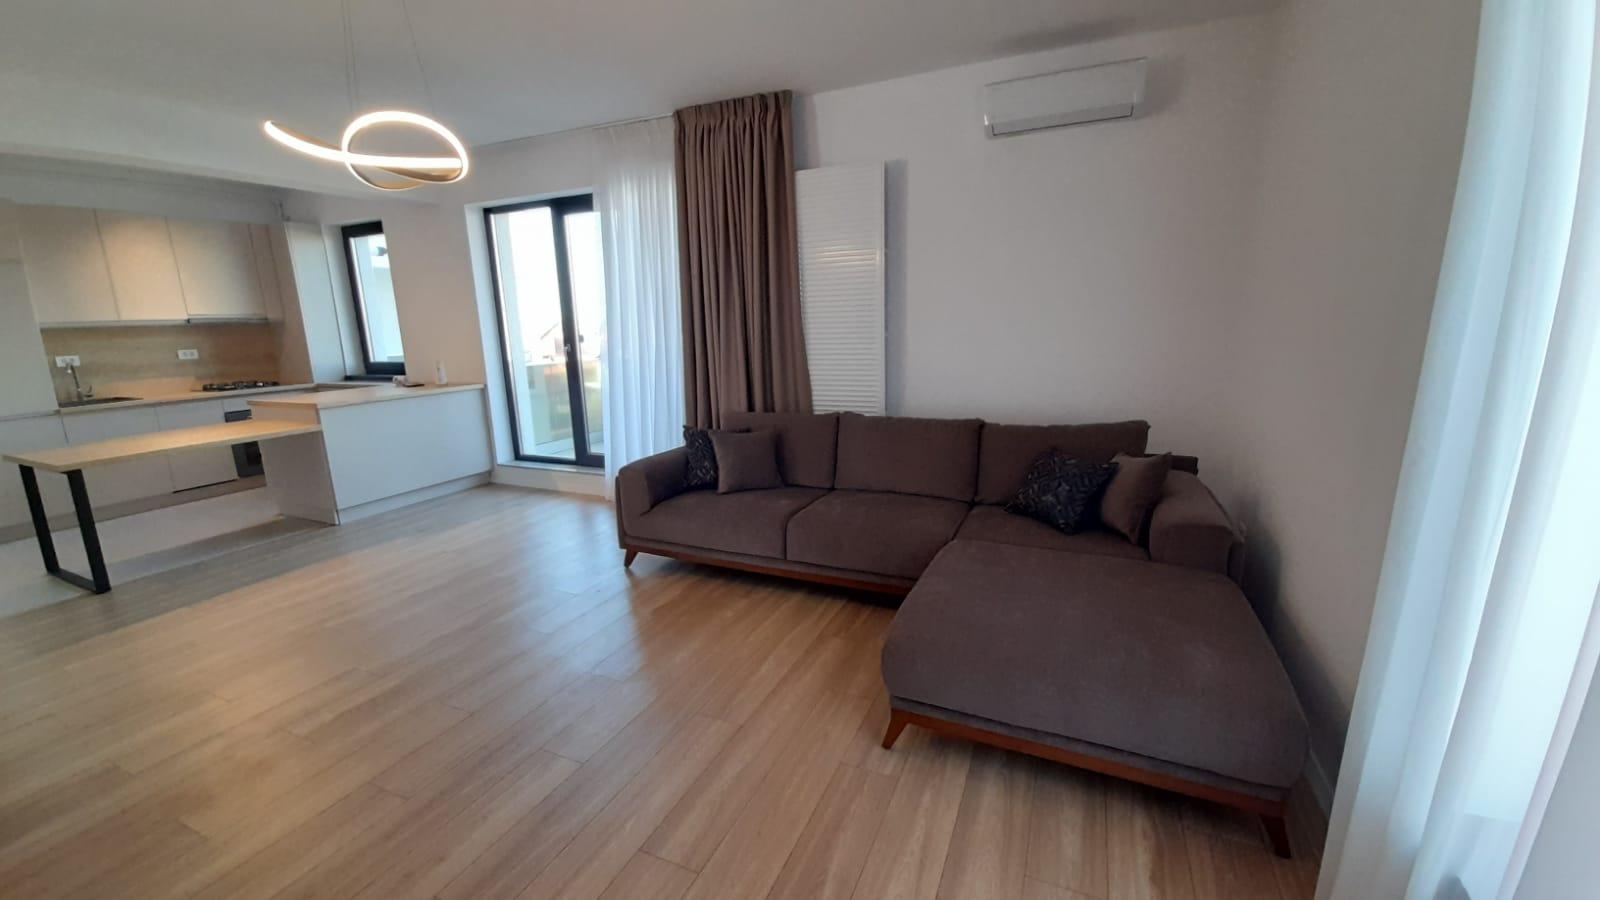 Apartament | 3 camere | Pipera | Pipera OMV Lux mobilat si utilat